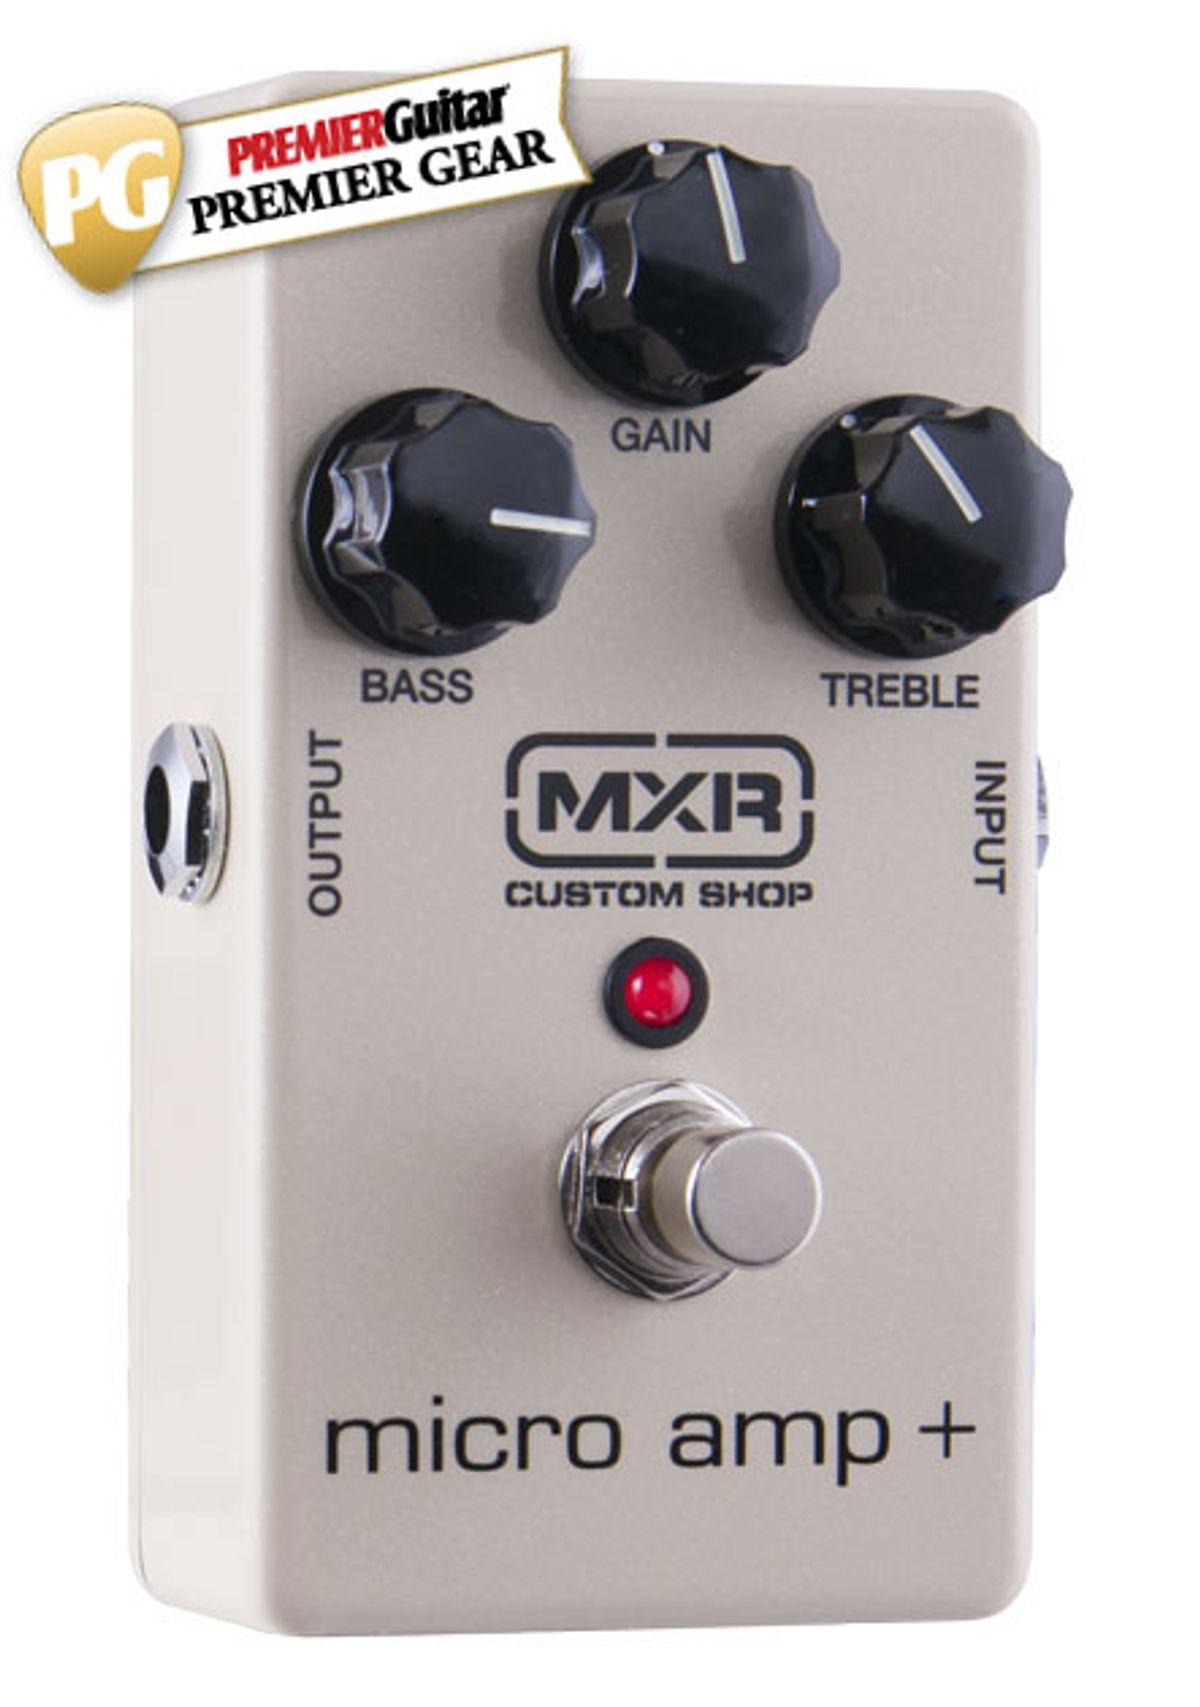 MXR Custom Shop Micro Amp+ Review